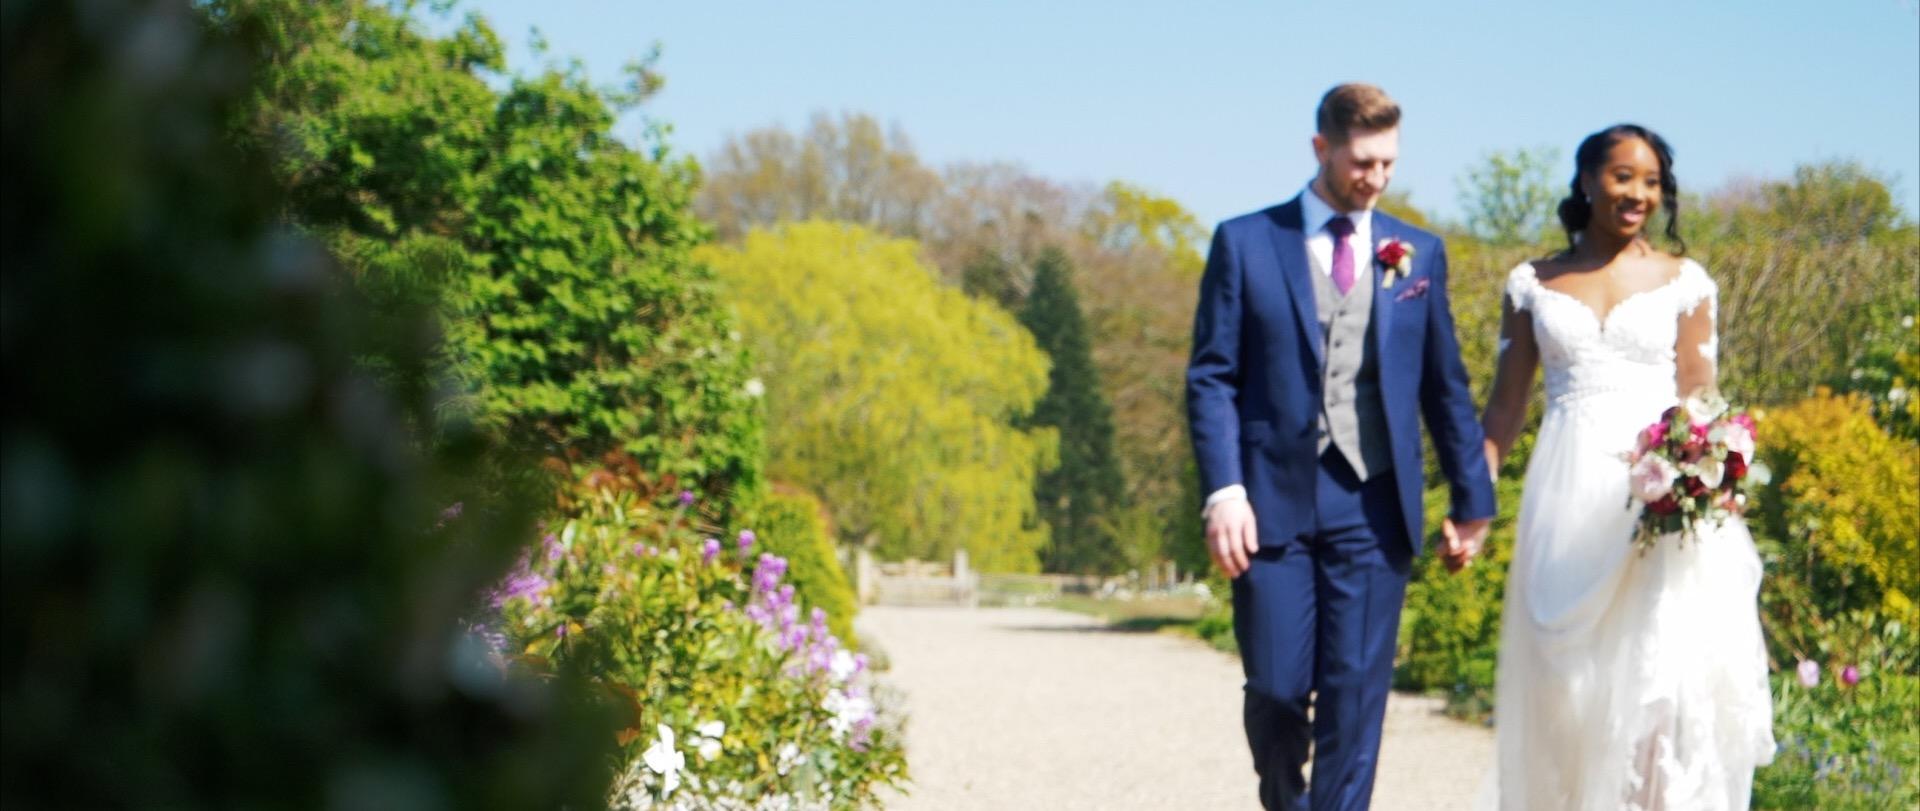 Gaynes Park beautiful wedding videography.jpg